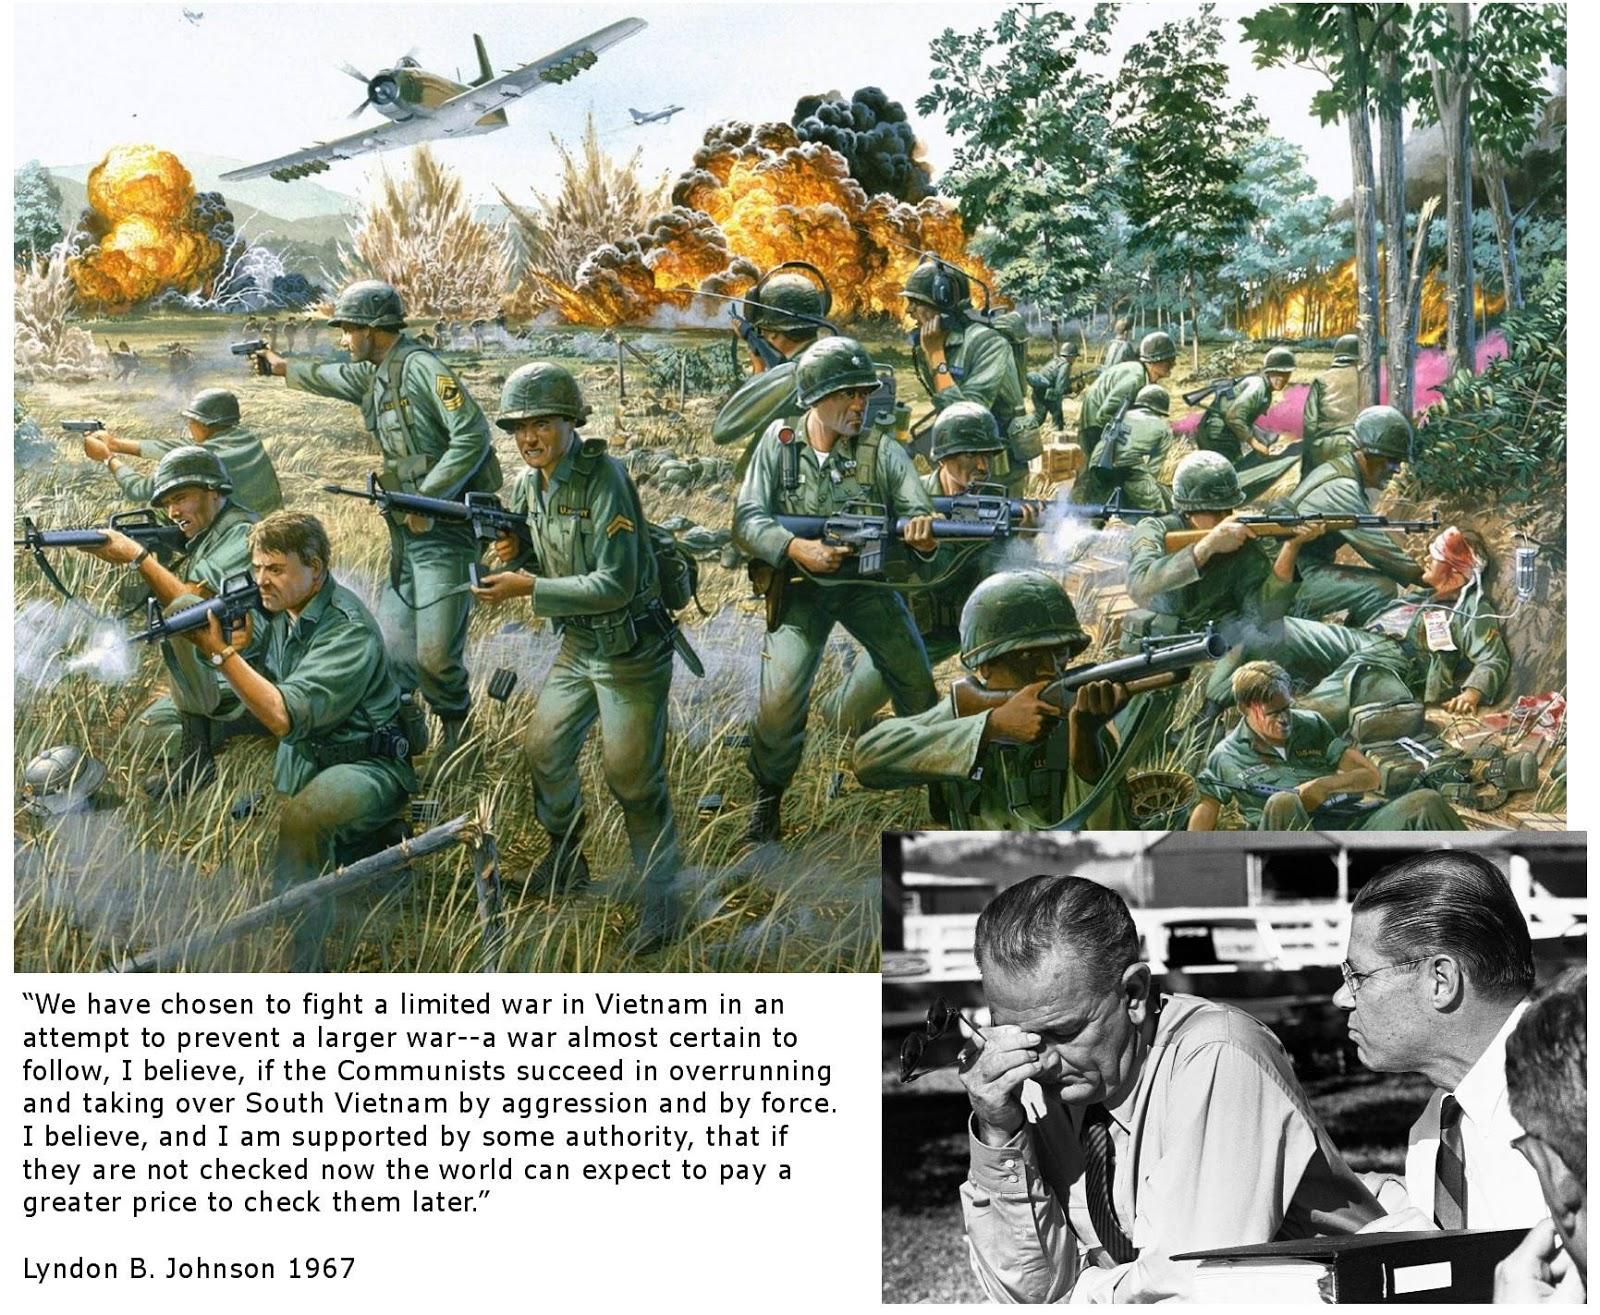 lyndon b johnson and vietnam war Lyndon b johnson: biography of lyndon already frustrated by the demands of the vietnam war, johnson responded with restraint but called up 15,000 navy.